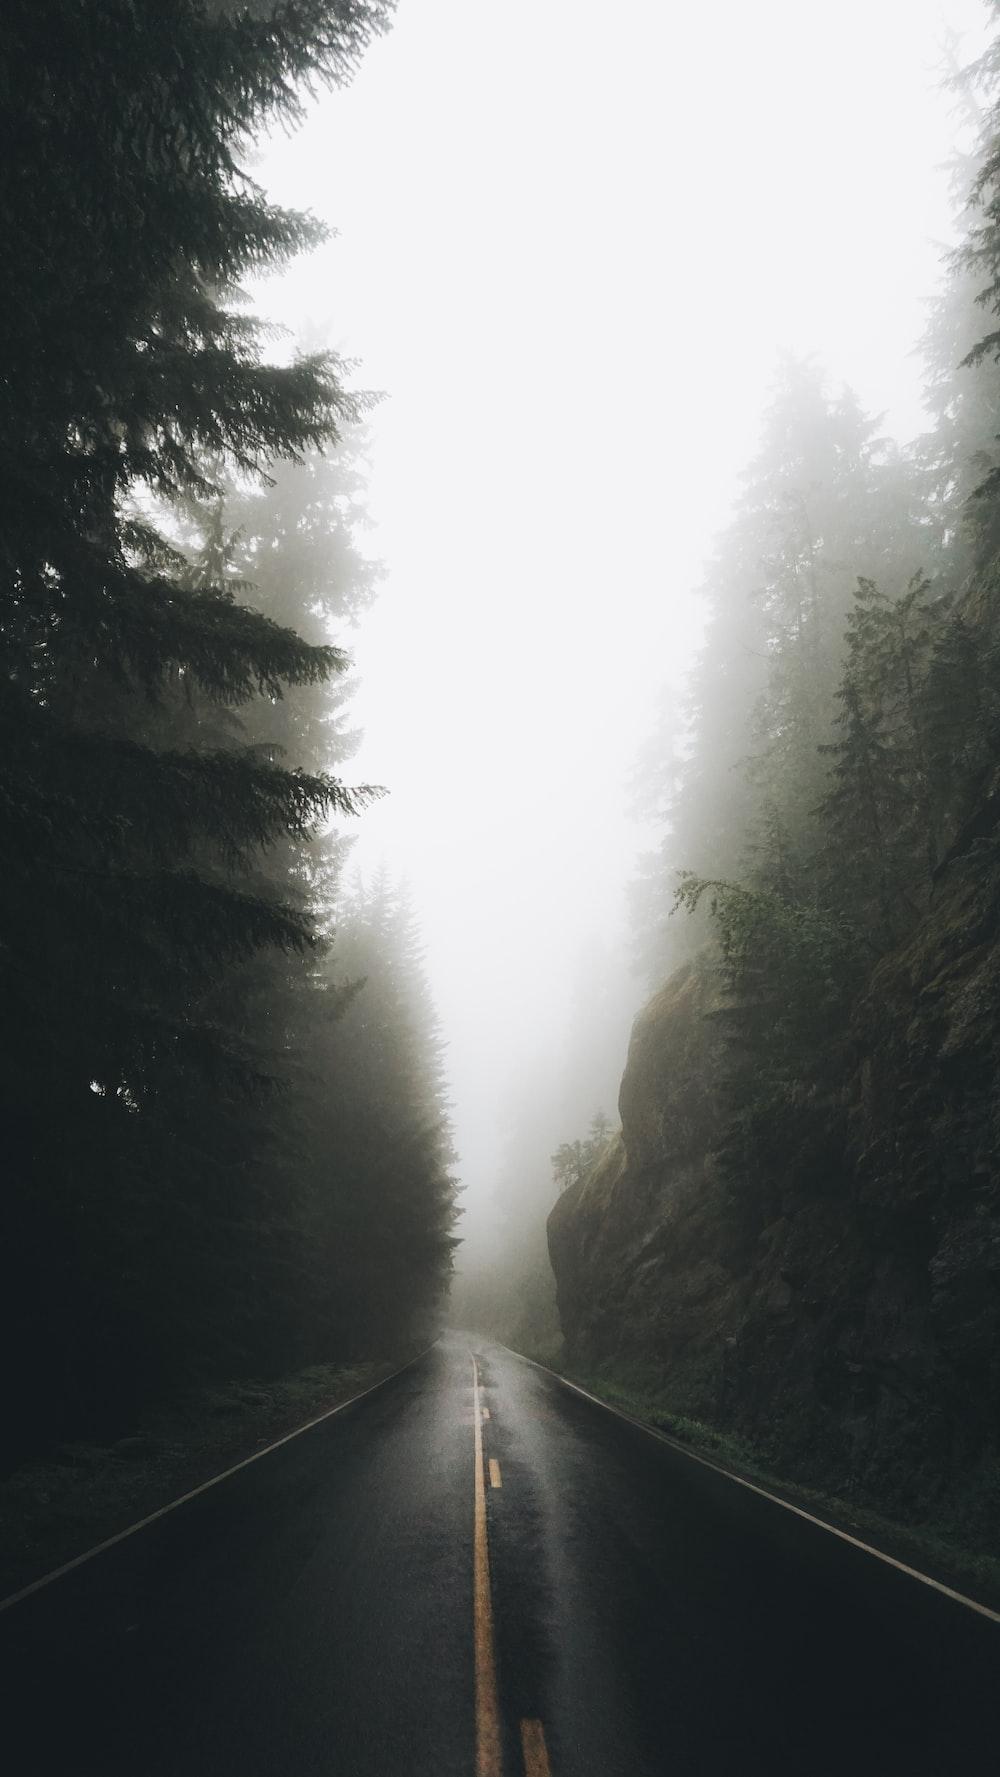 gray asphalt road near trees